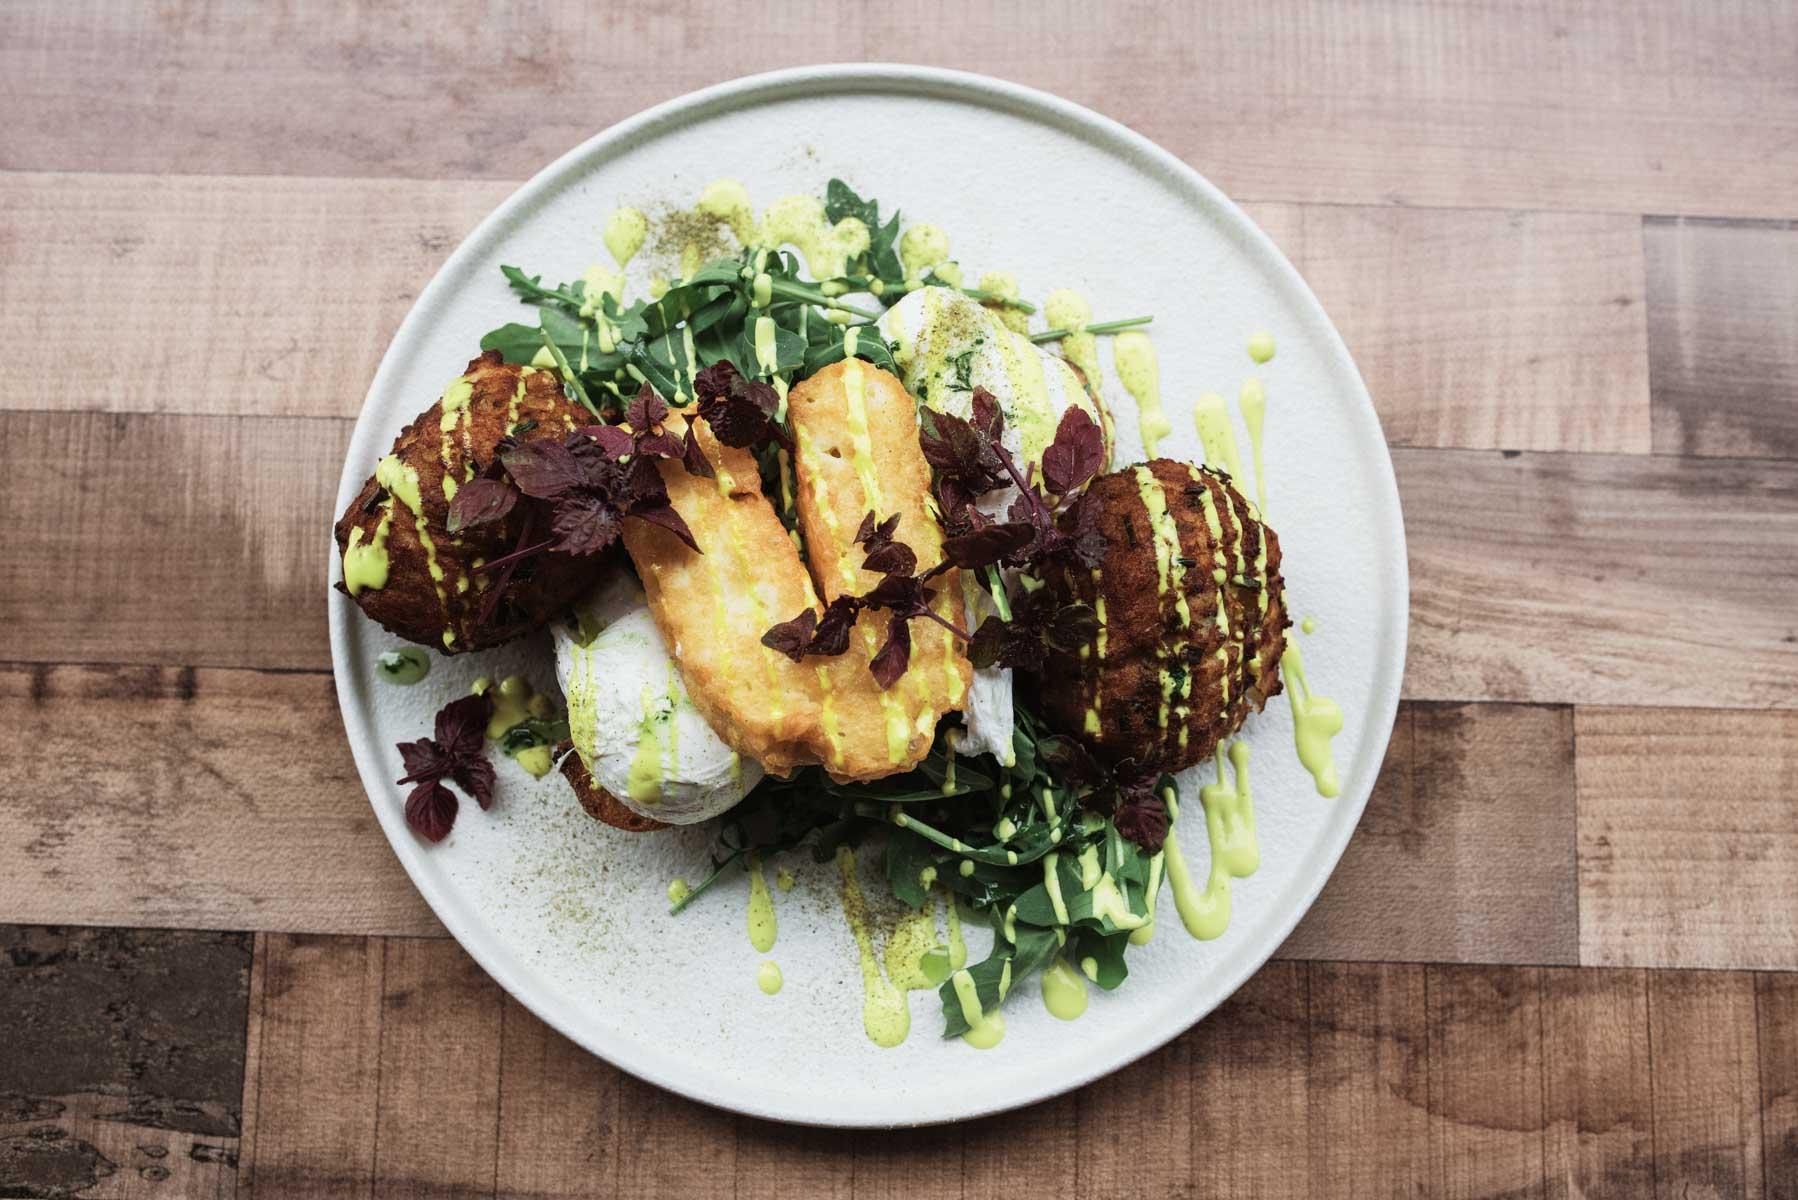 Witchin Kitchen - Sandgate Cafe Terri Hanlon Photography Breakfast